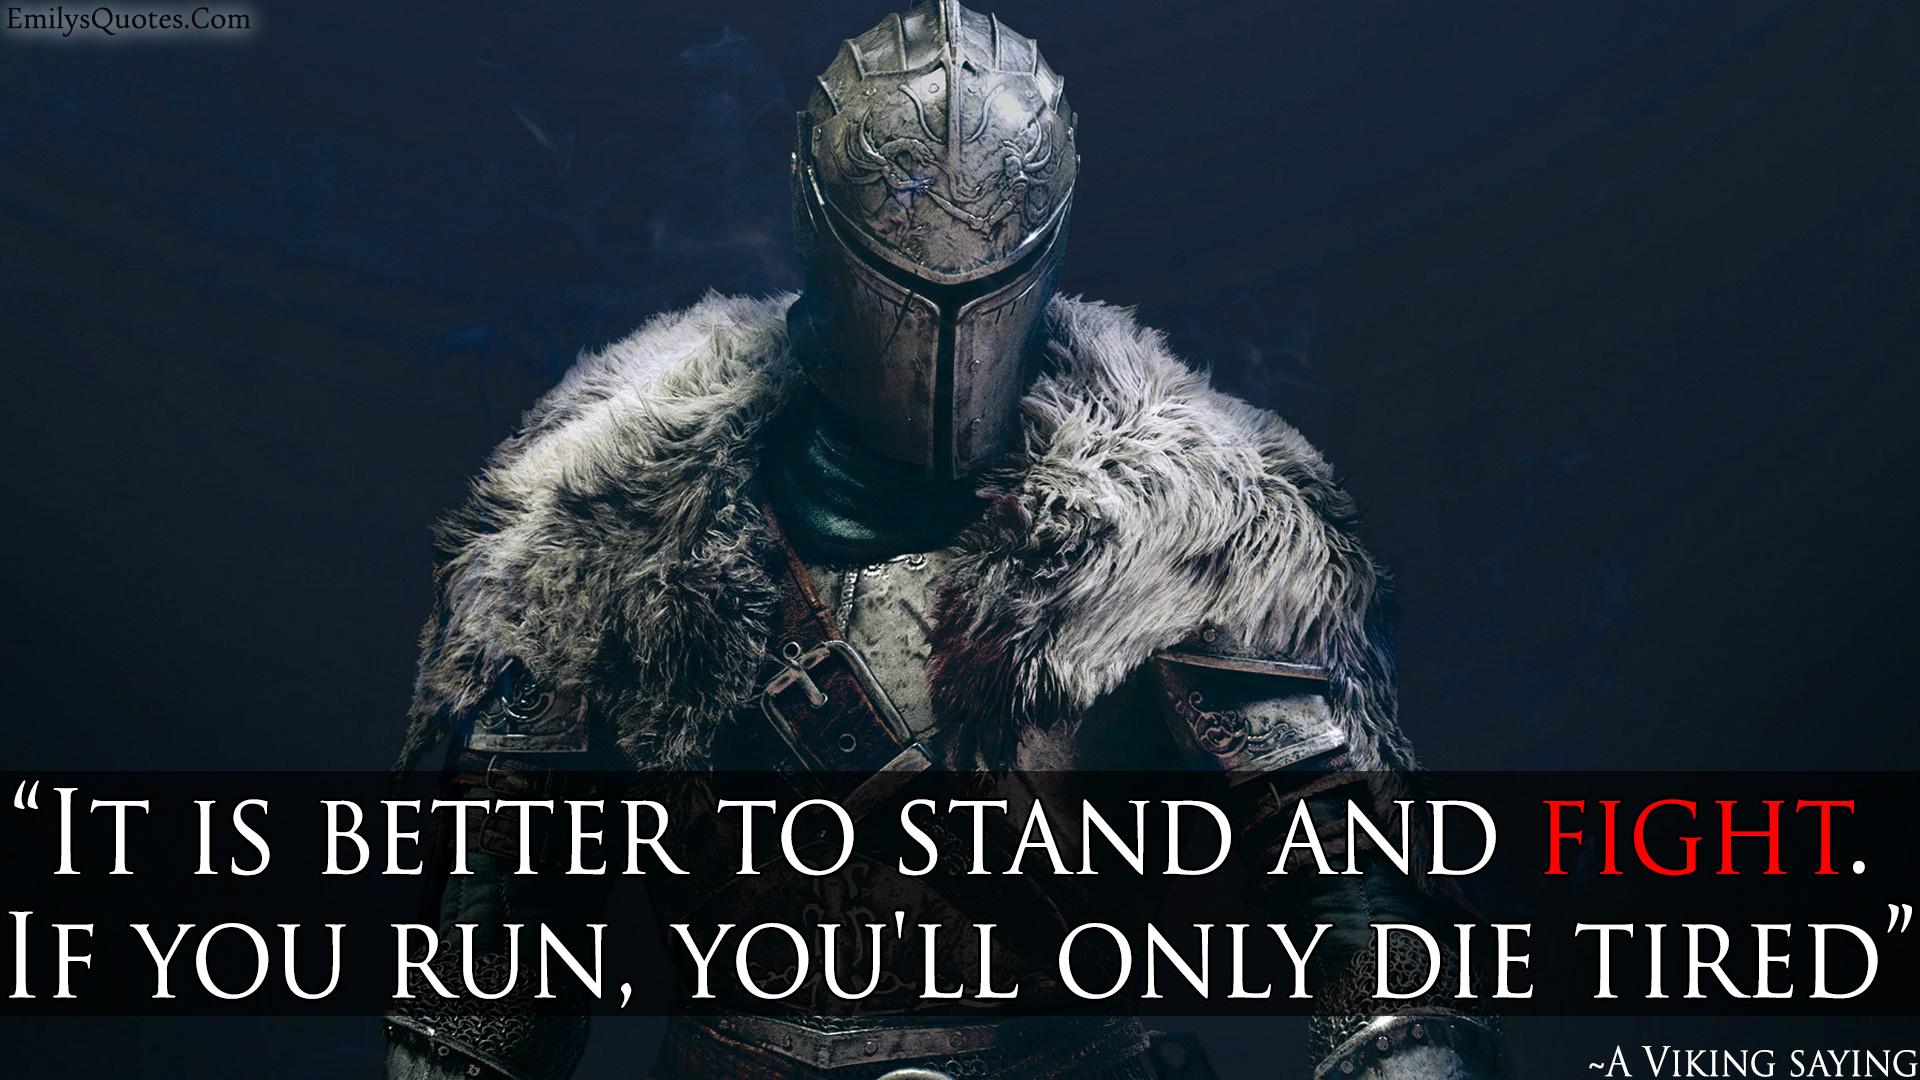 EmilysQuotes.Com - war, fight, death, motivational, encouraging, brave, A Viking saying